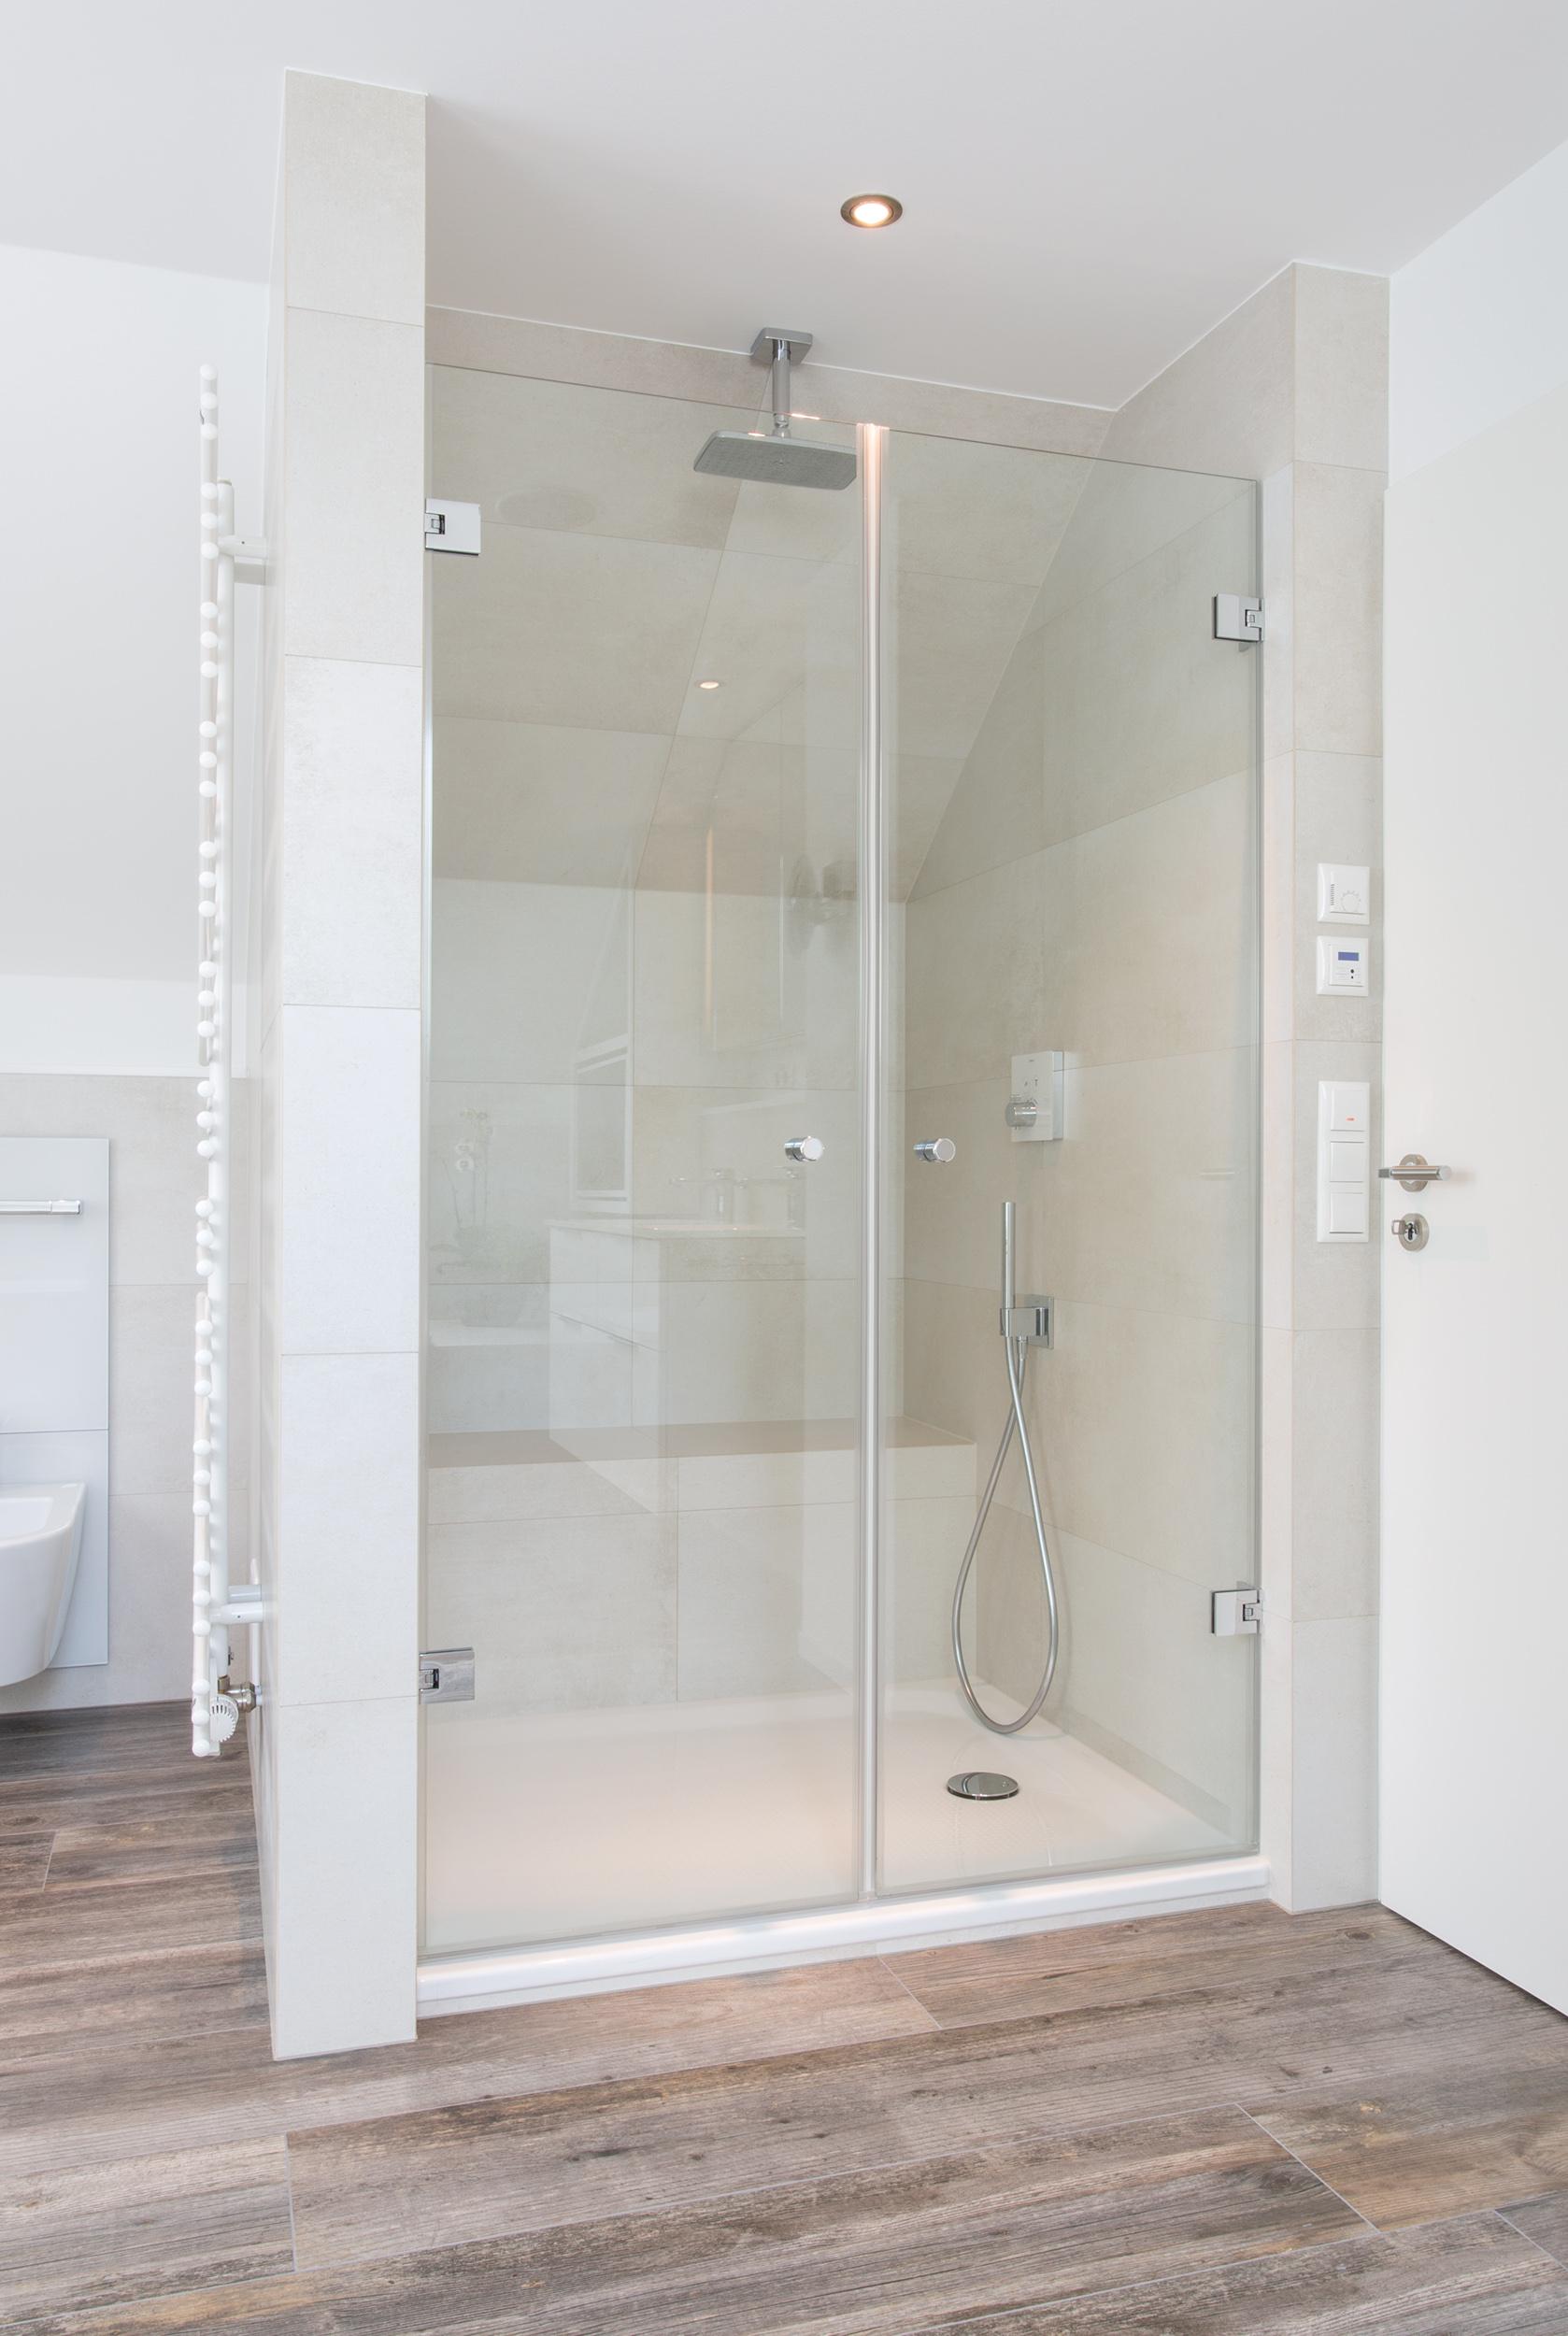 Luxuriöse Dusche